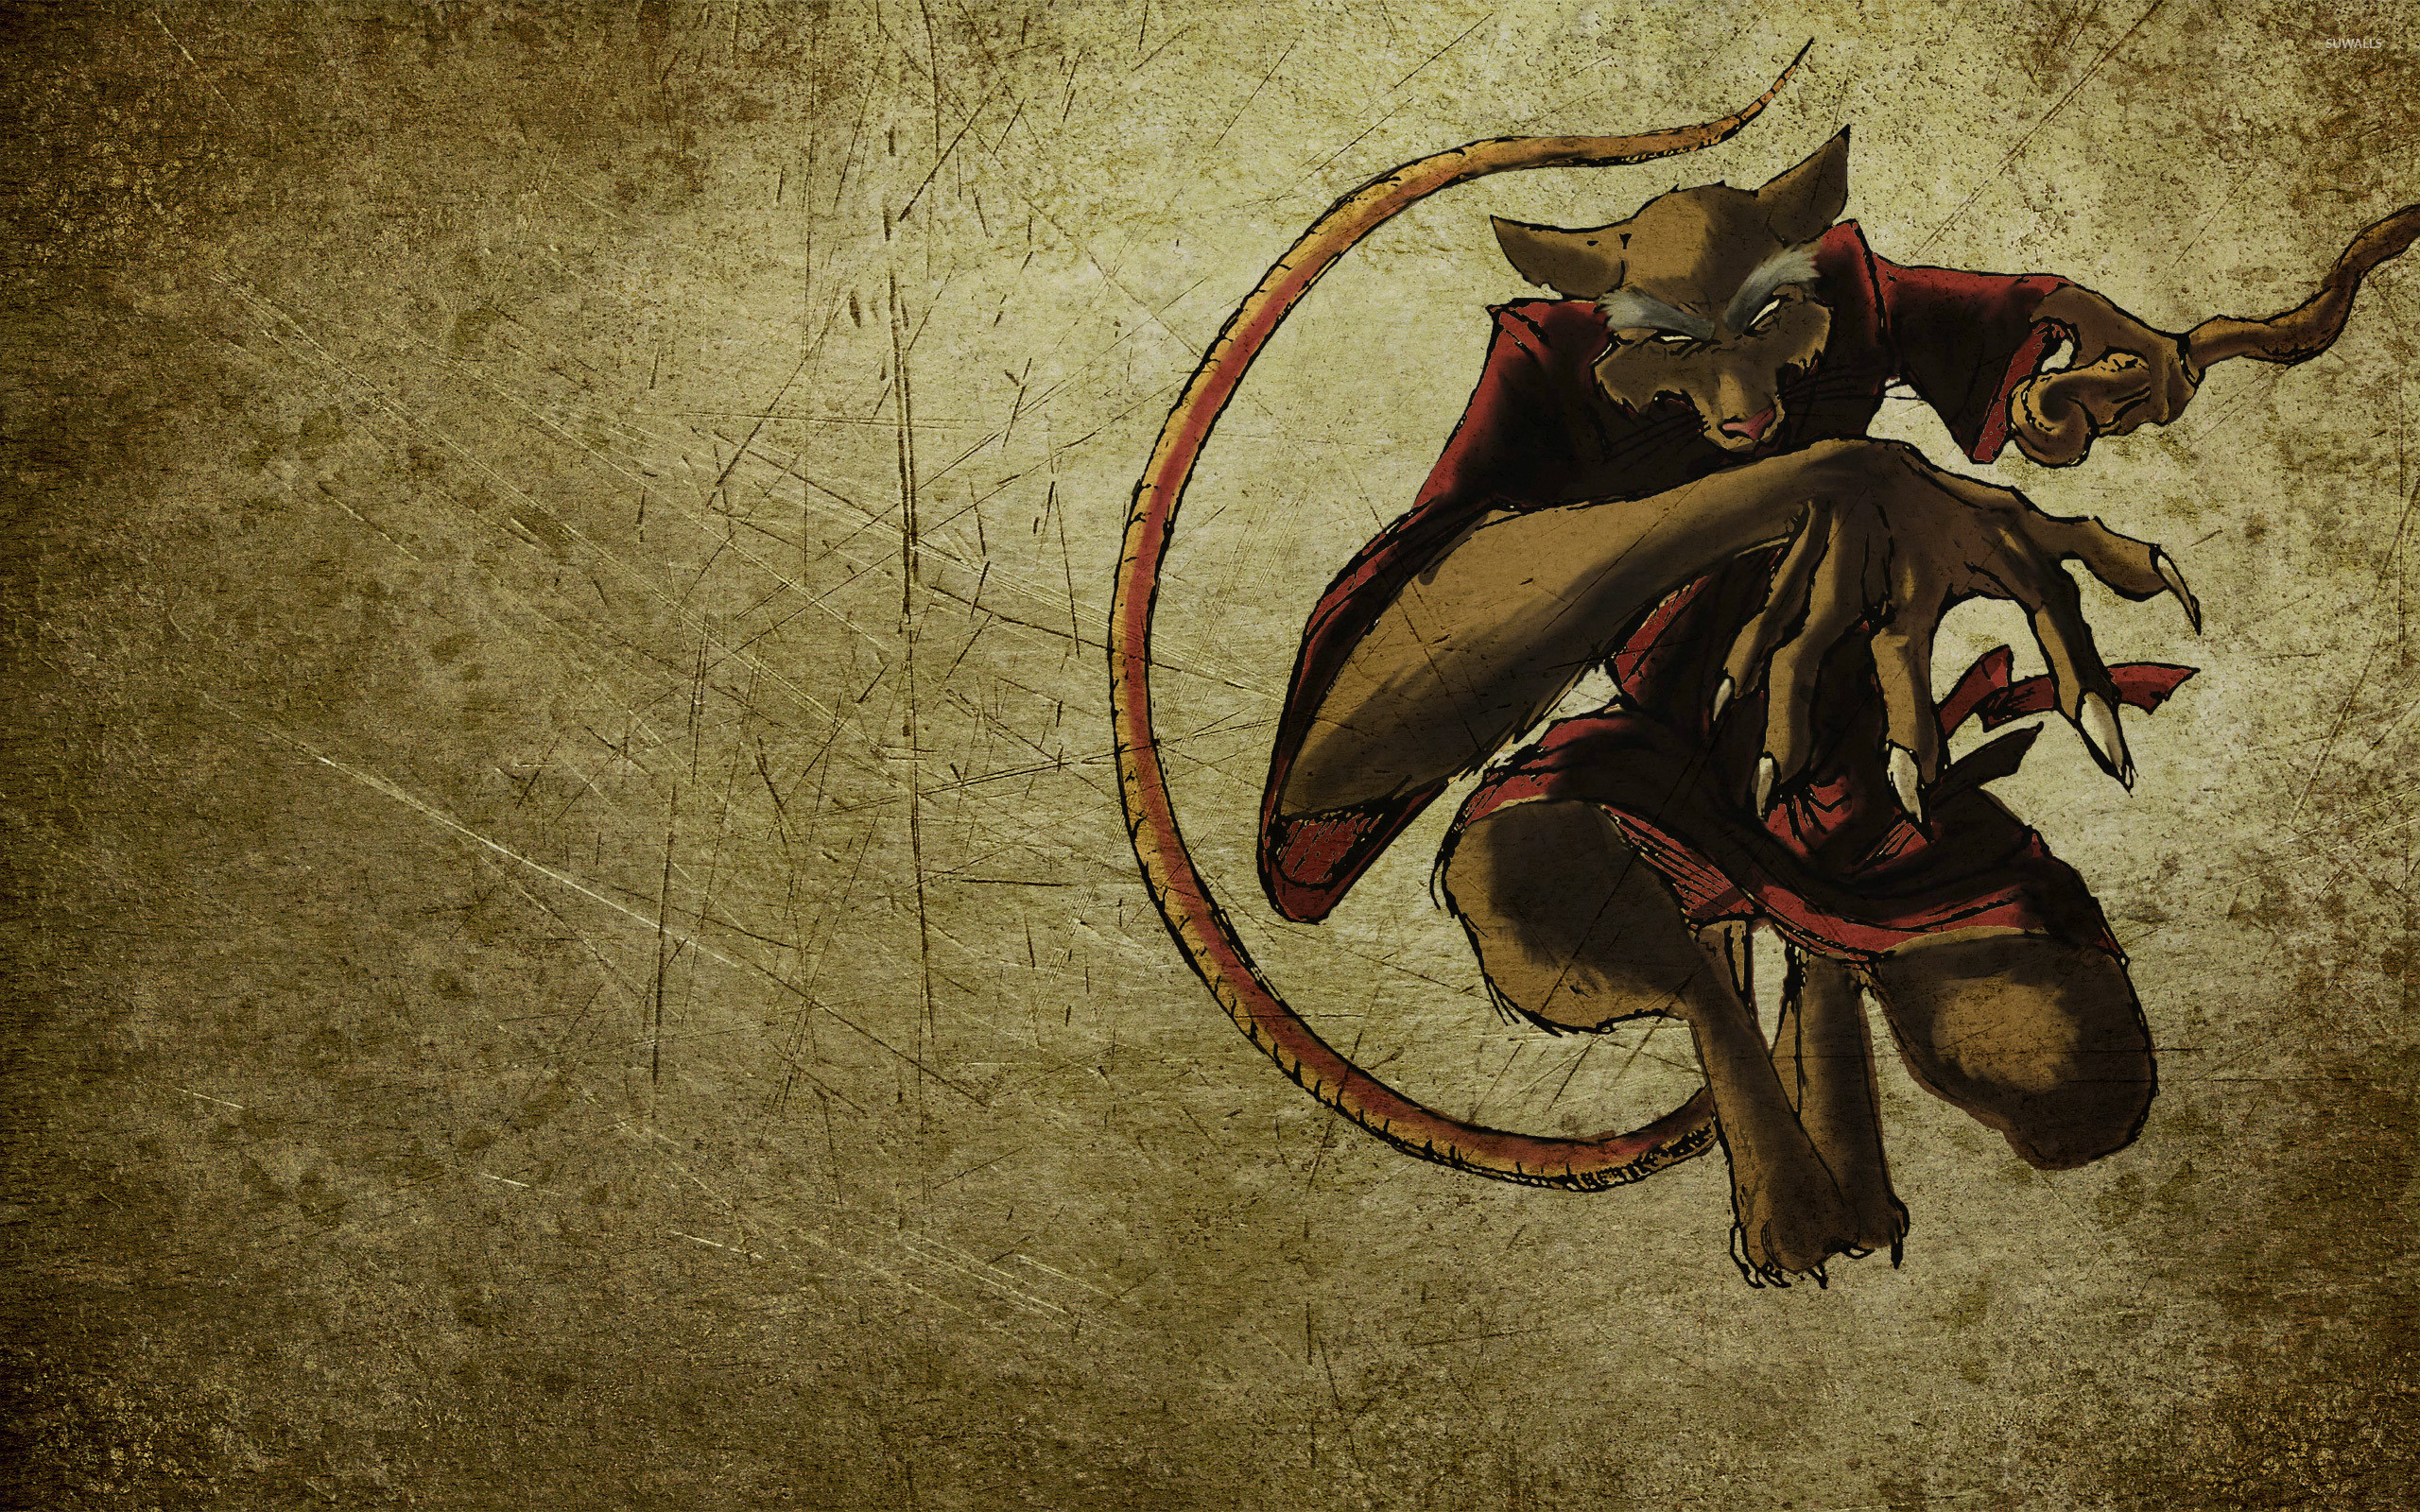 Res: 2560x1600, Splinter - Teenage Mutant Ninja Turtles wallpaper